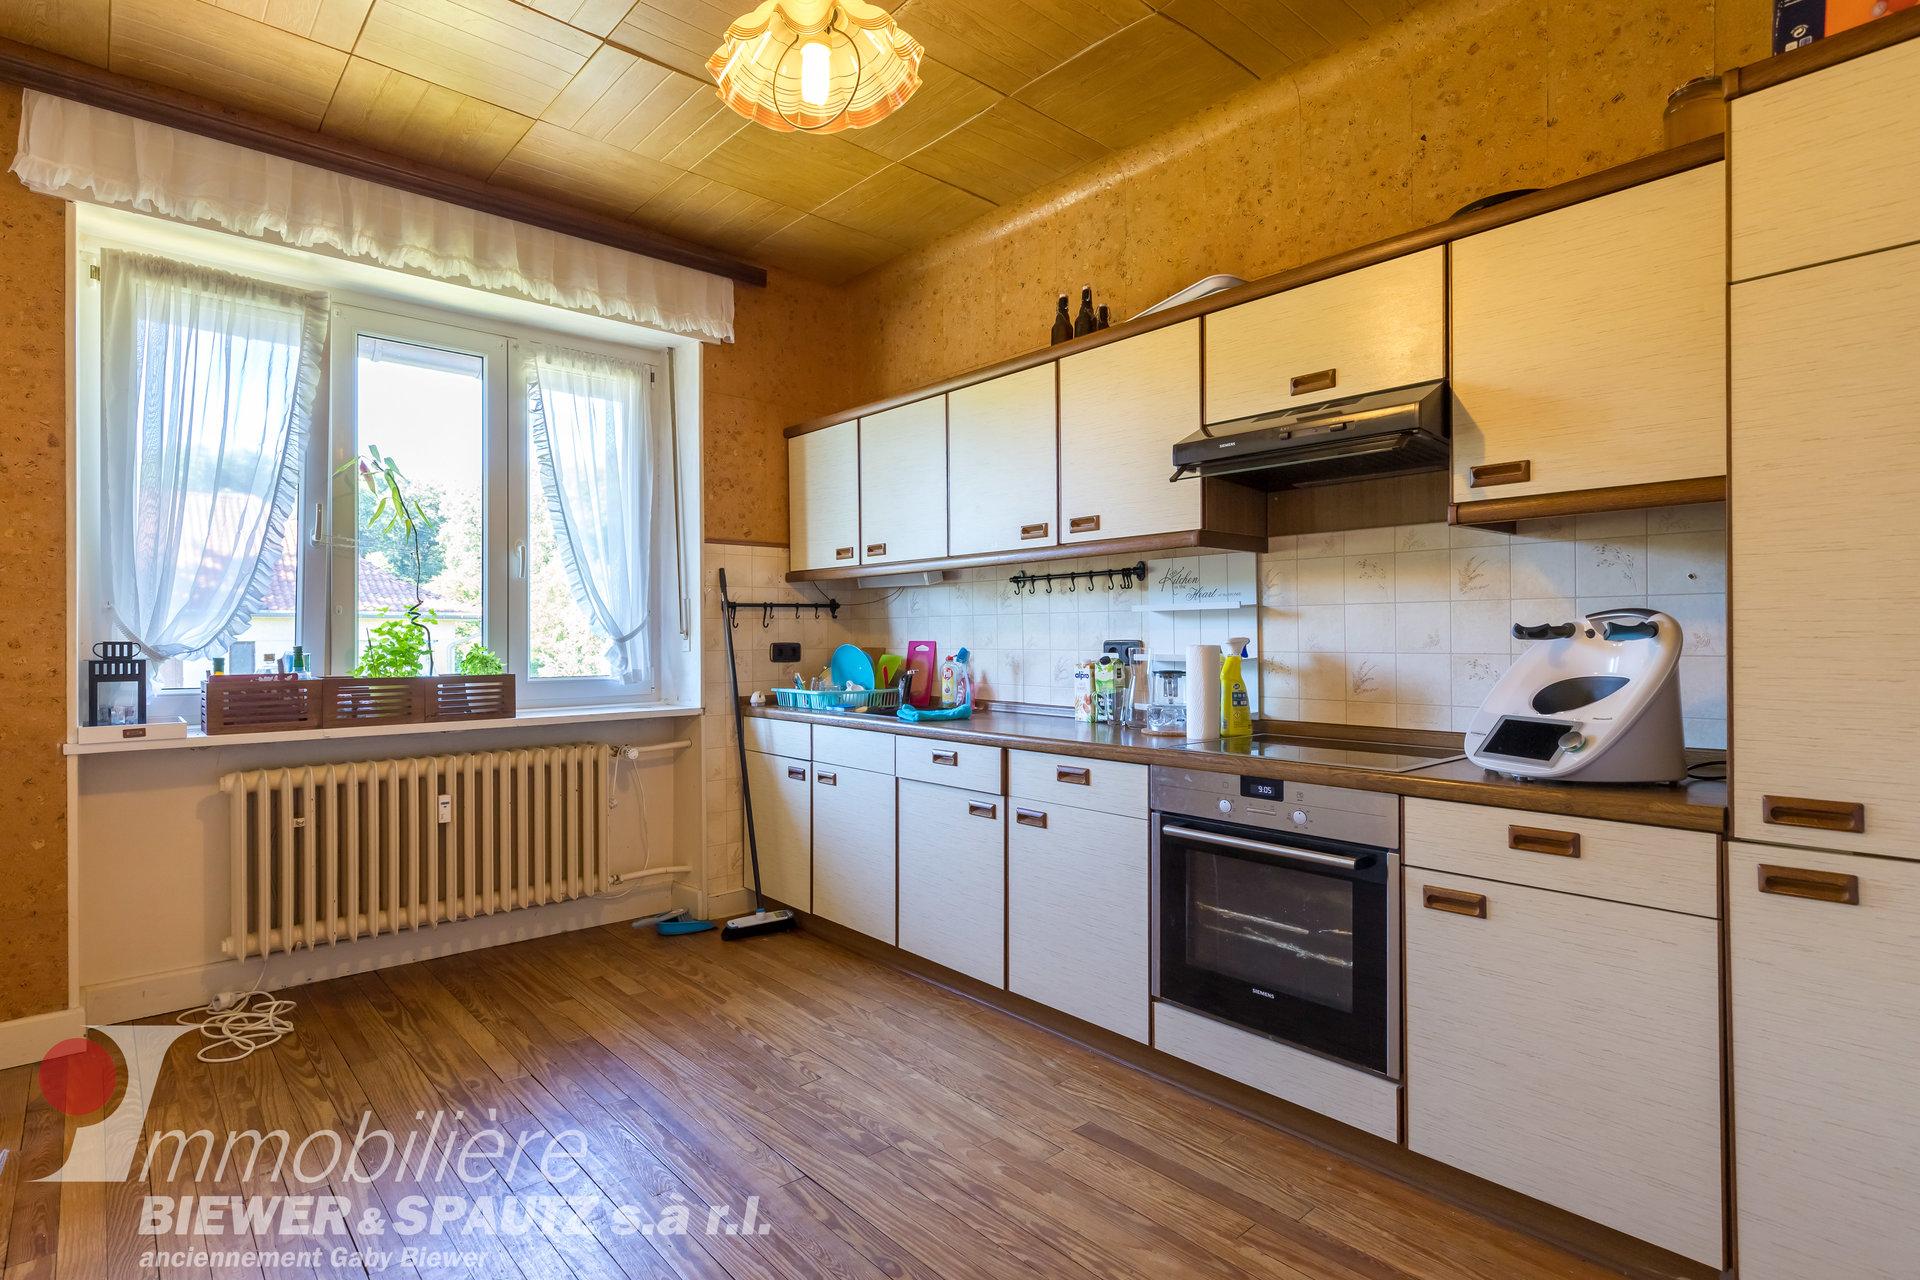 TO RENT - appartment/duplex 2 bedrooms in Consdorf